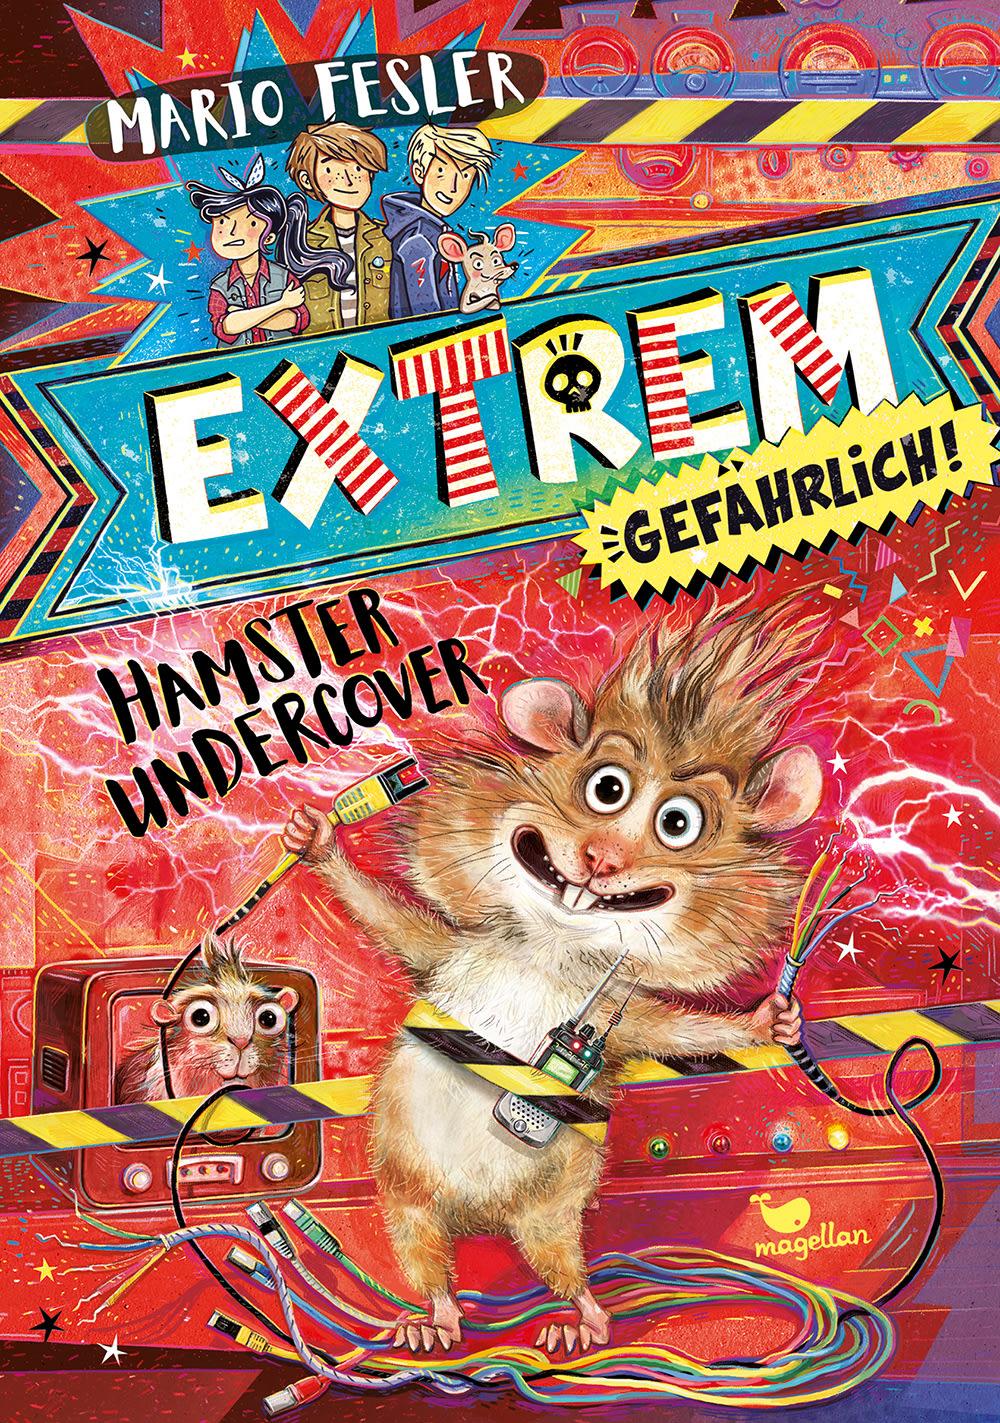 Cover Extrem gefährlich Band2 Hamster undercover Krimi Middle Grade von Mario Fesler